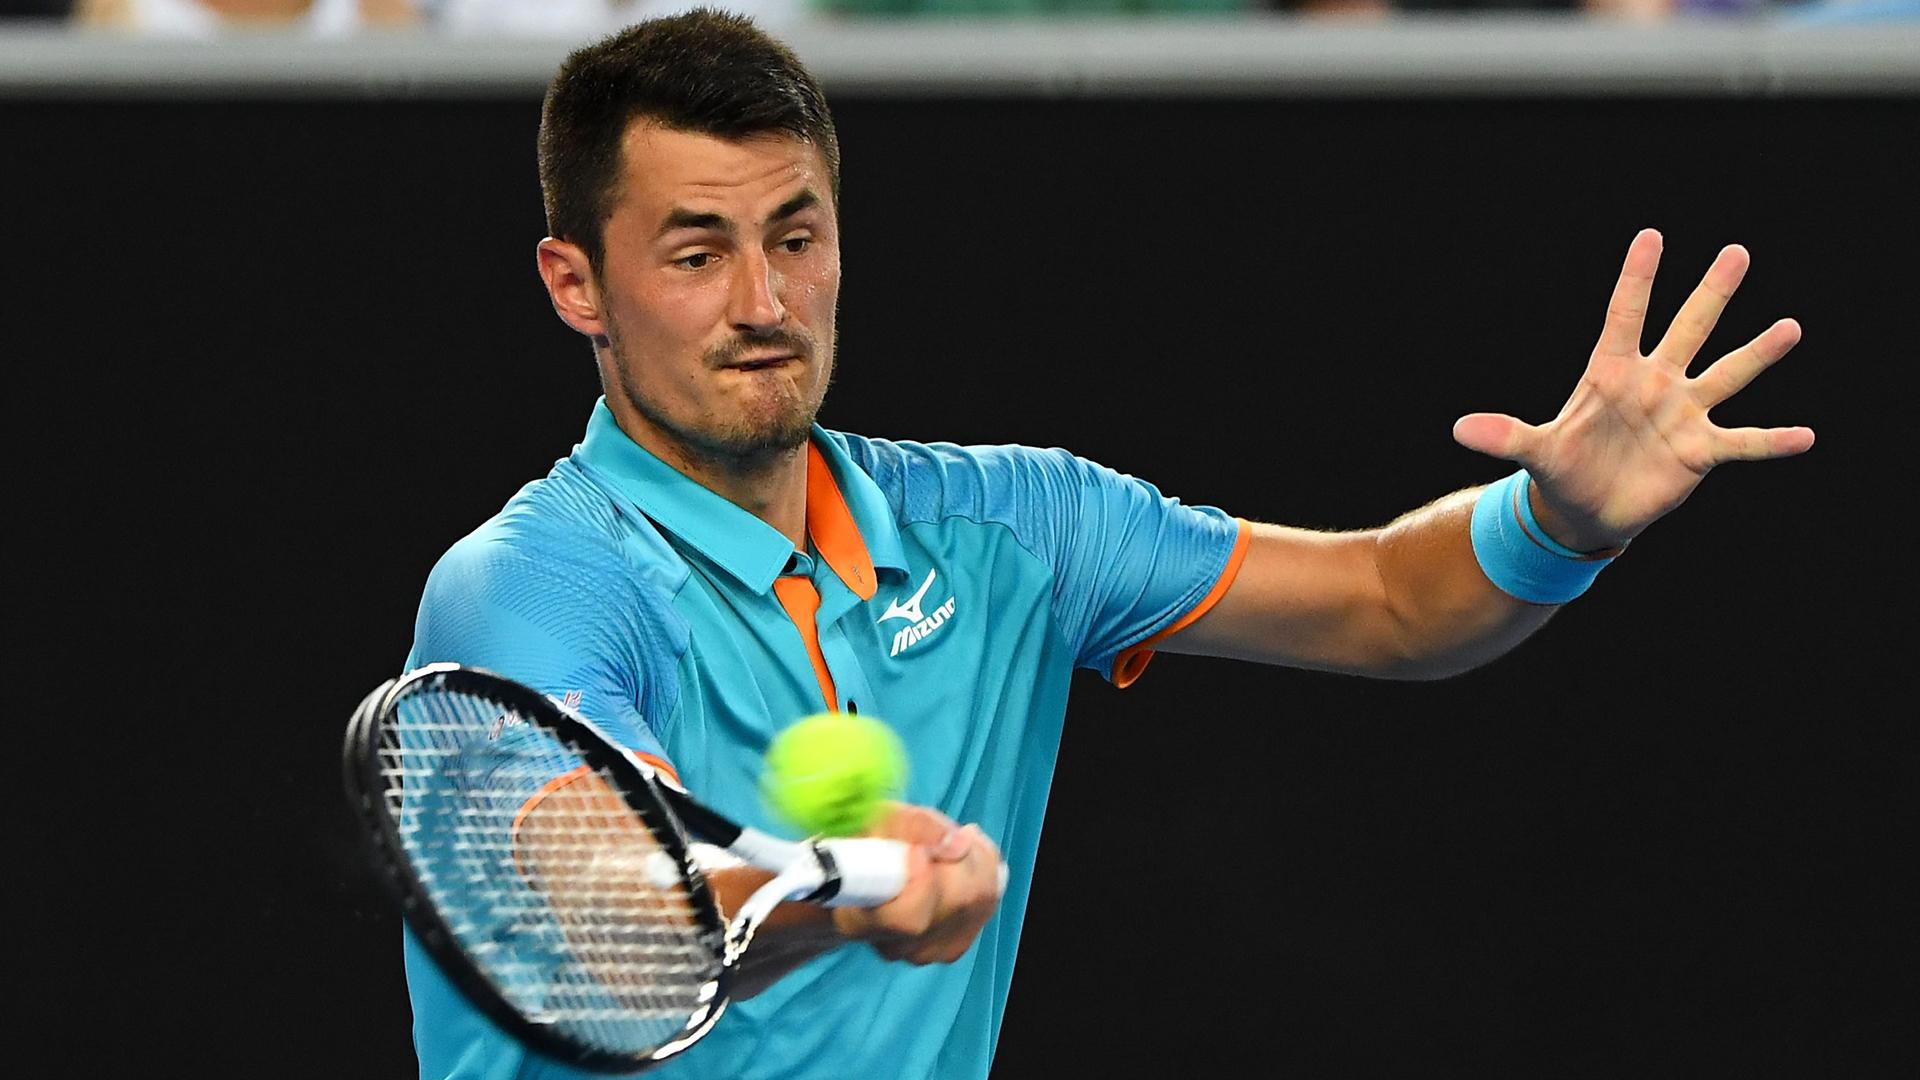 Tomic Sets Up Isner Clash In New York Tennis News Stadium Astro